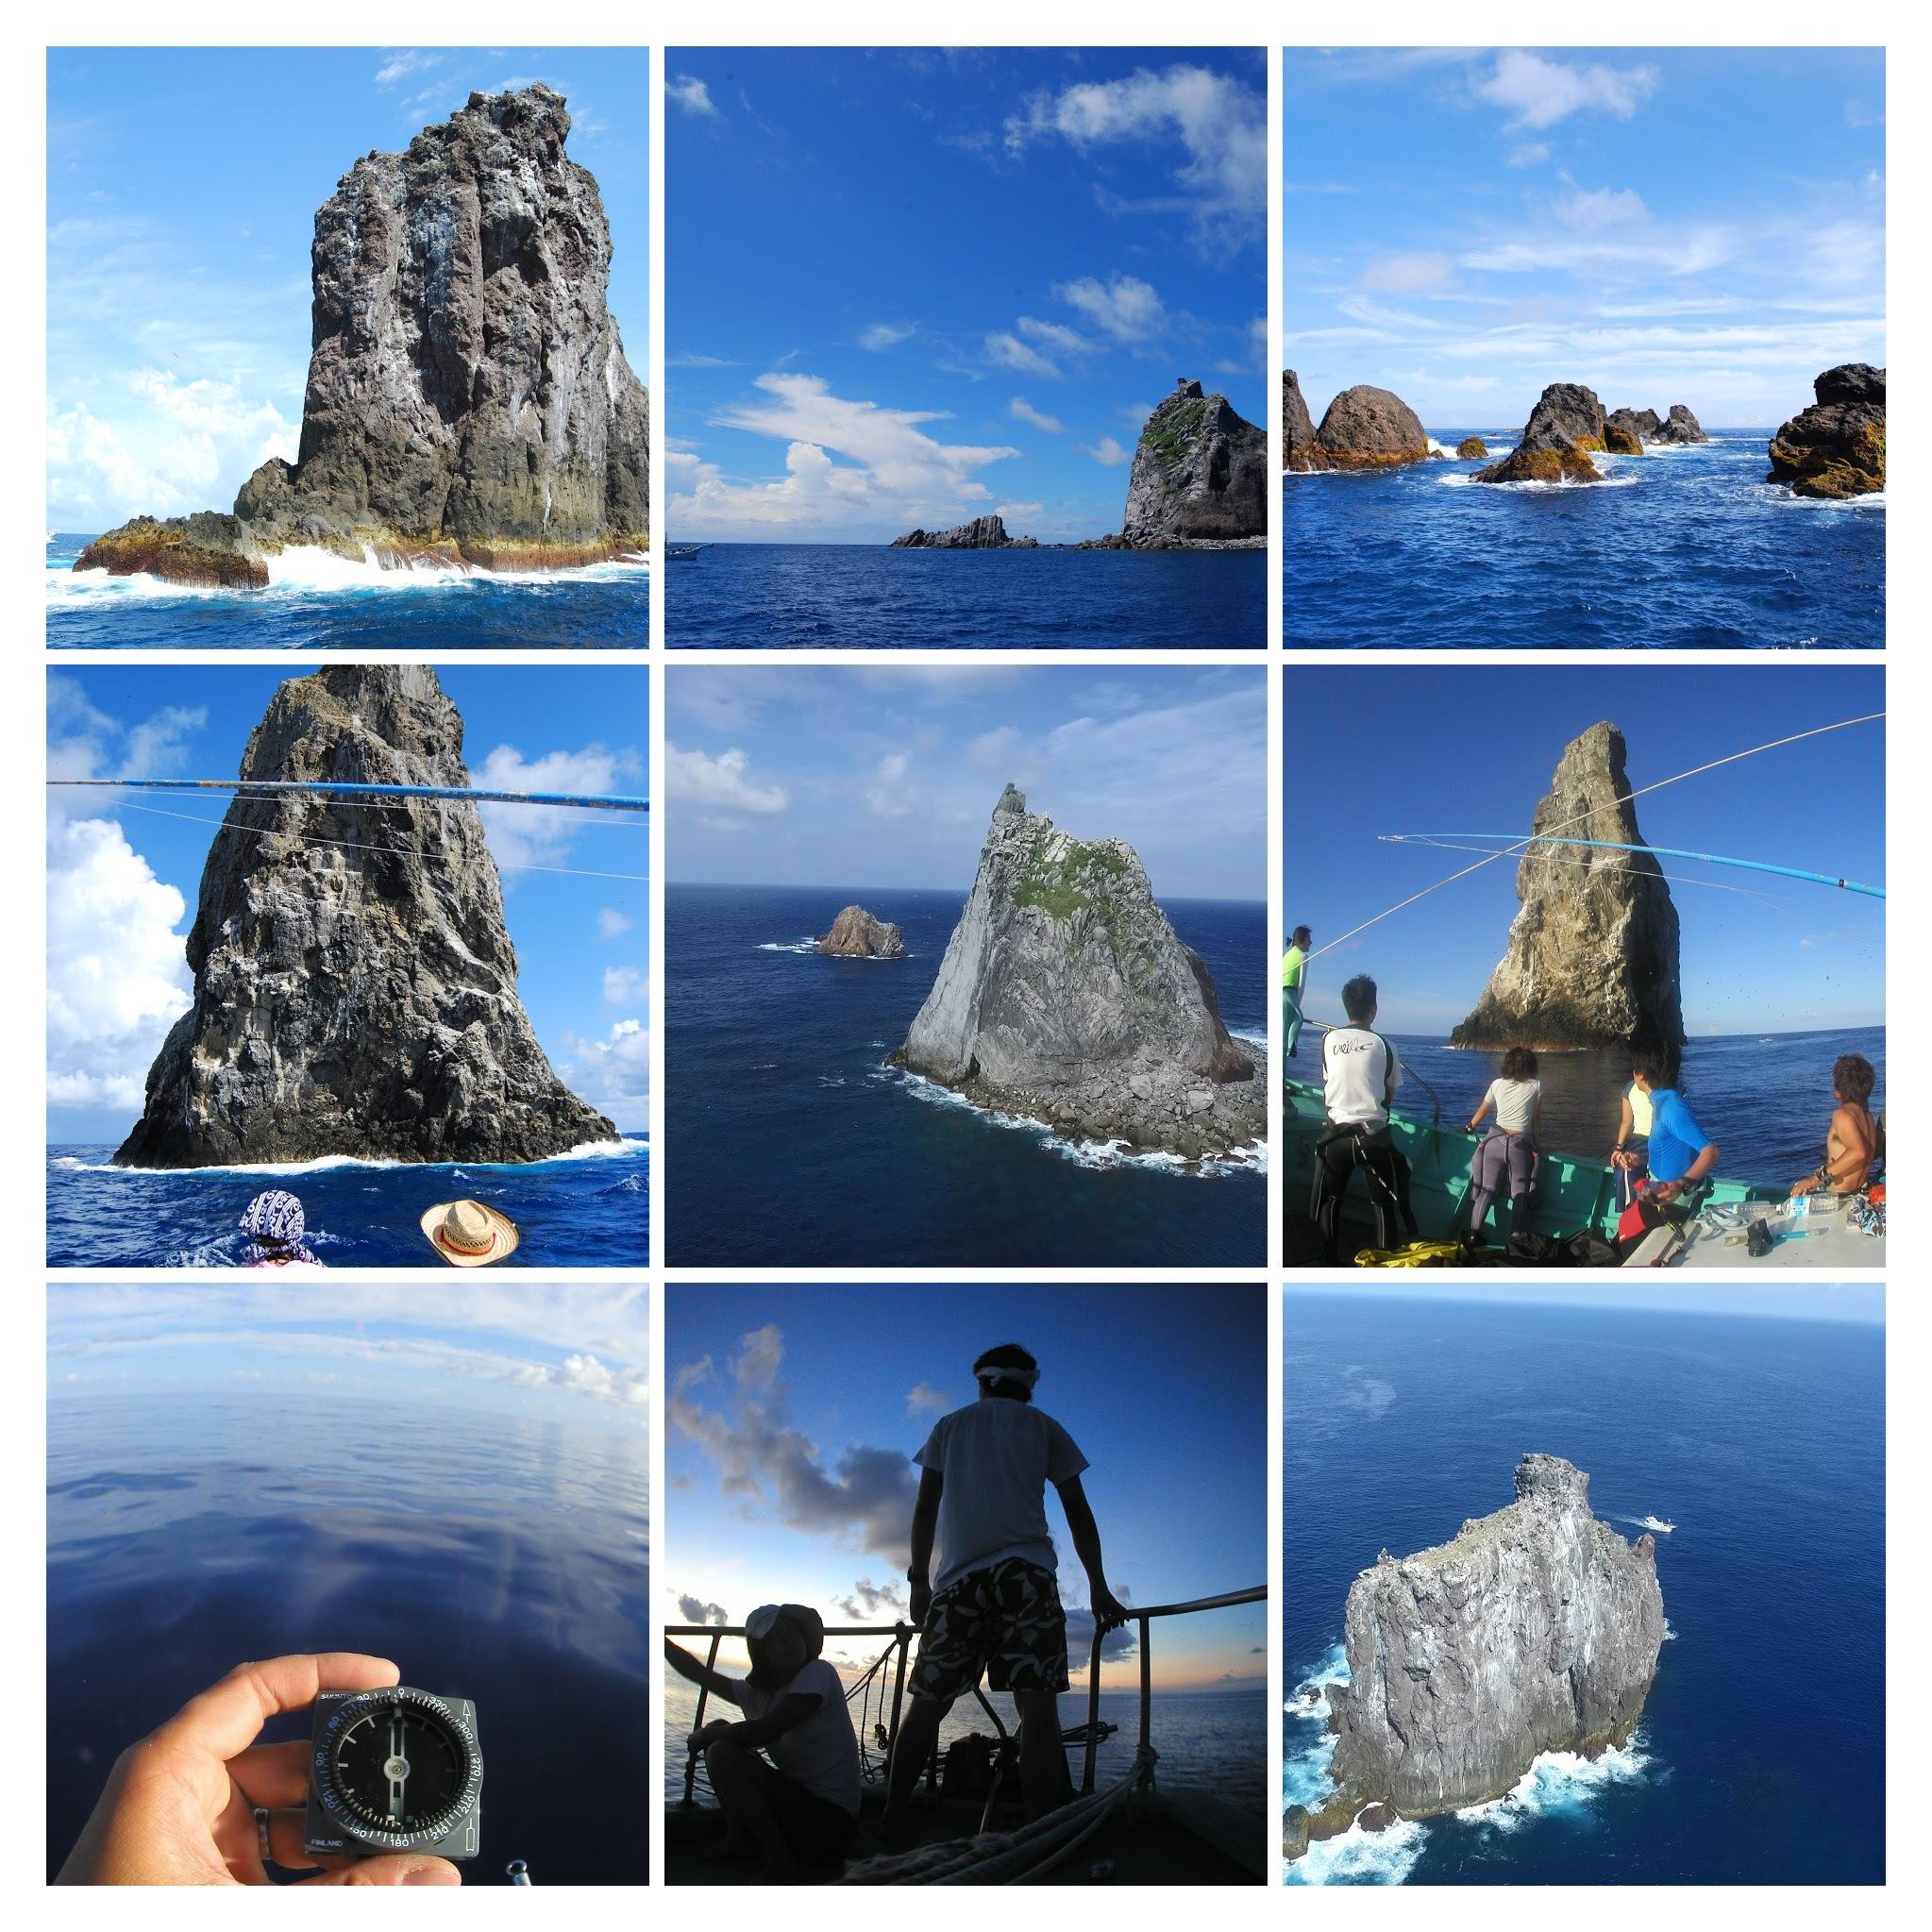 panoramio-111508685-COLLAGE.jpg